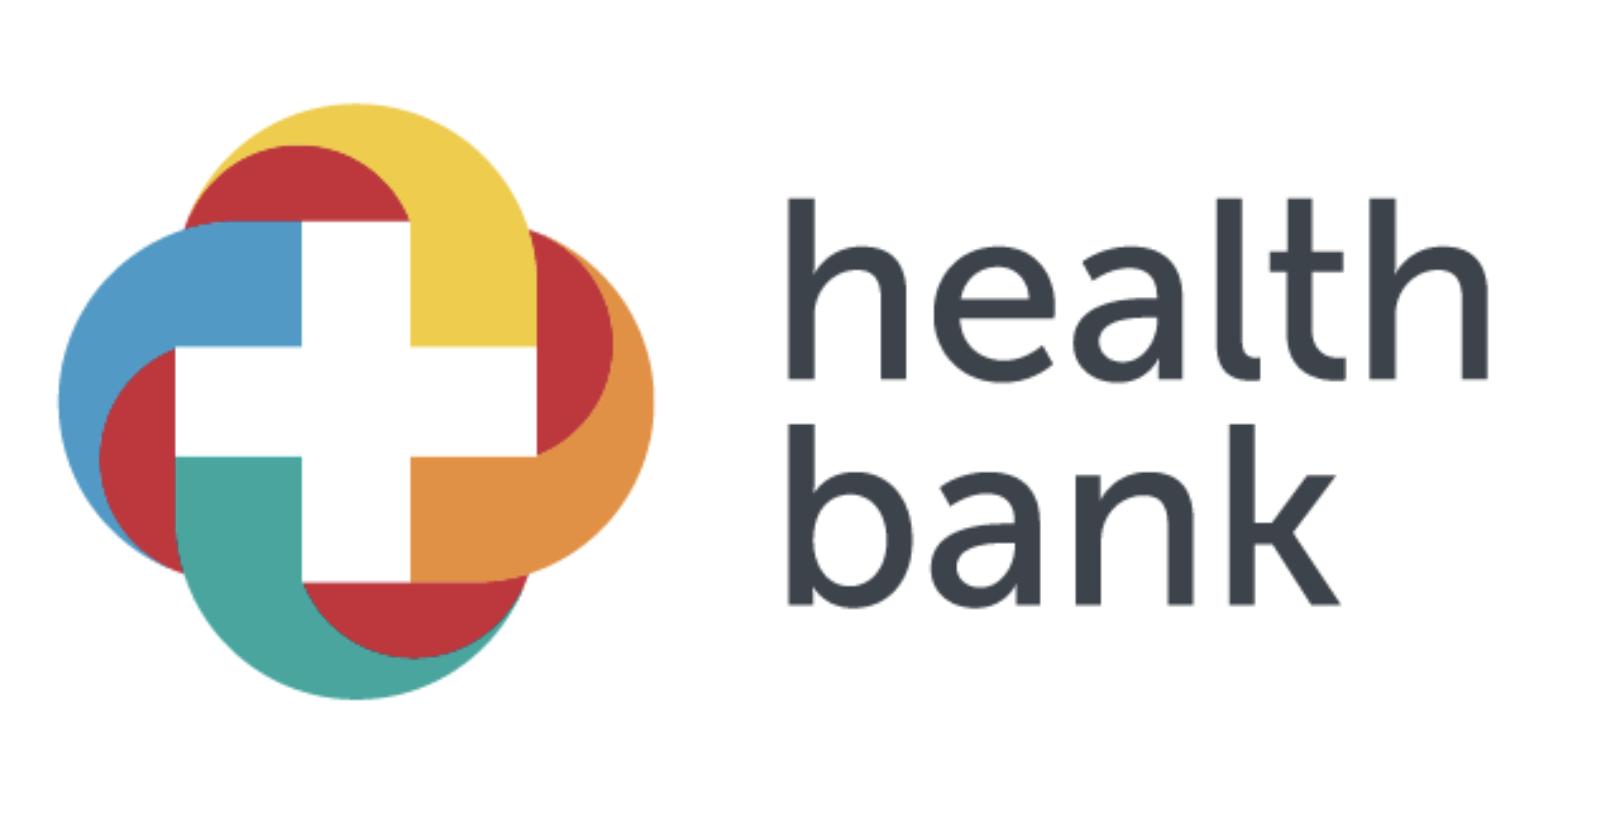 healthbank Logo